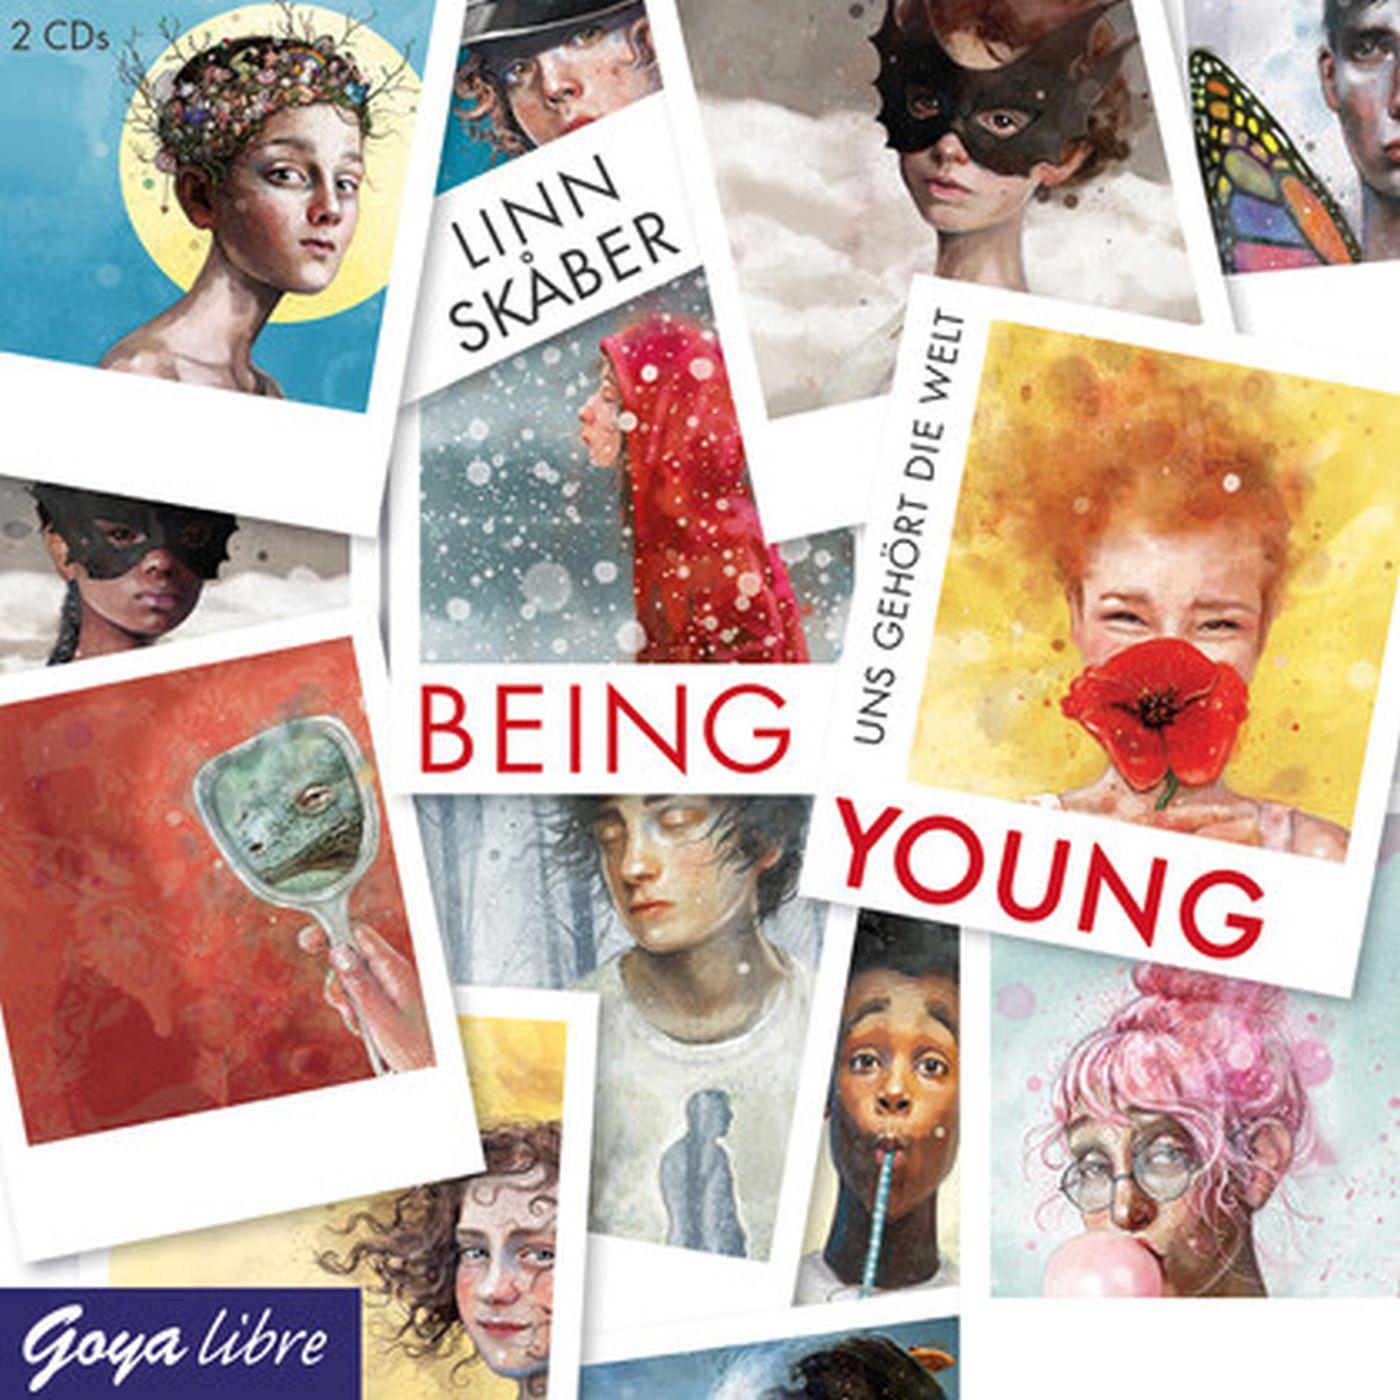 Linn Skåber - Being Young. Uns gehört die Welt